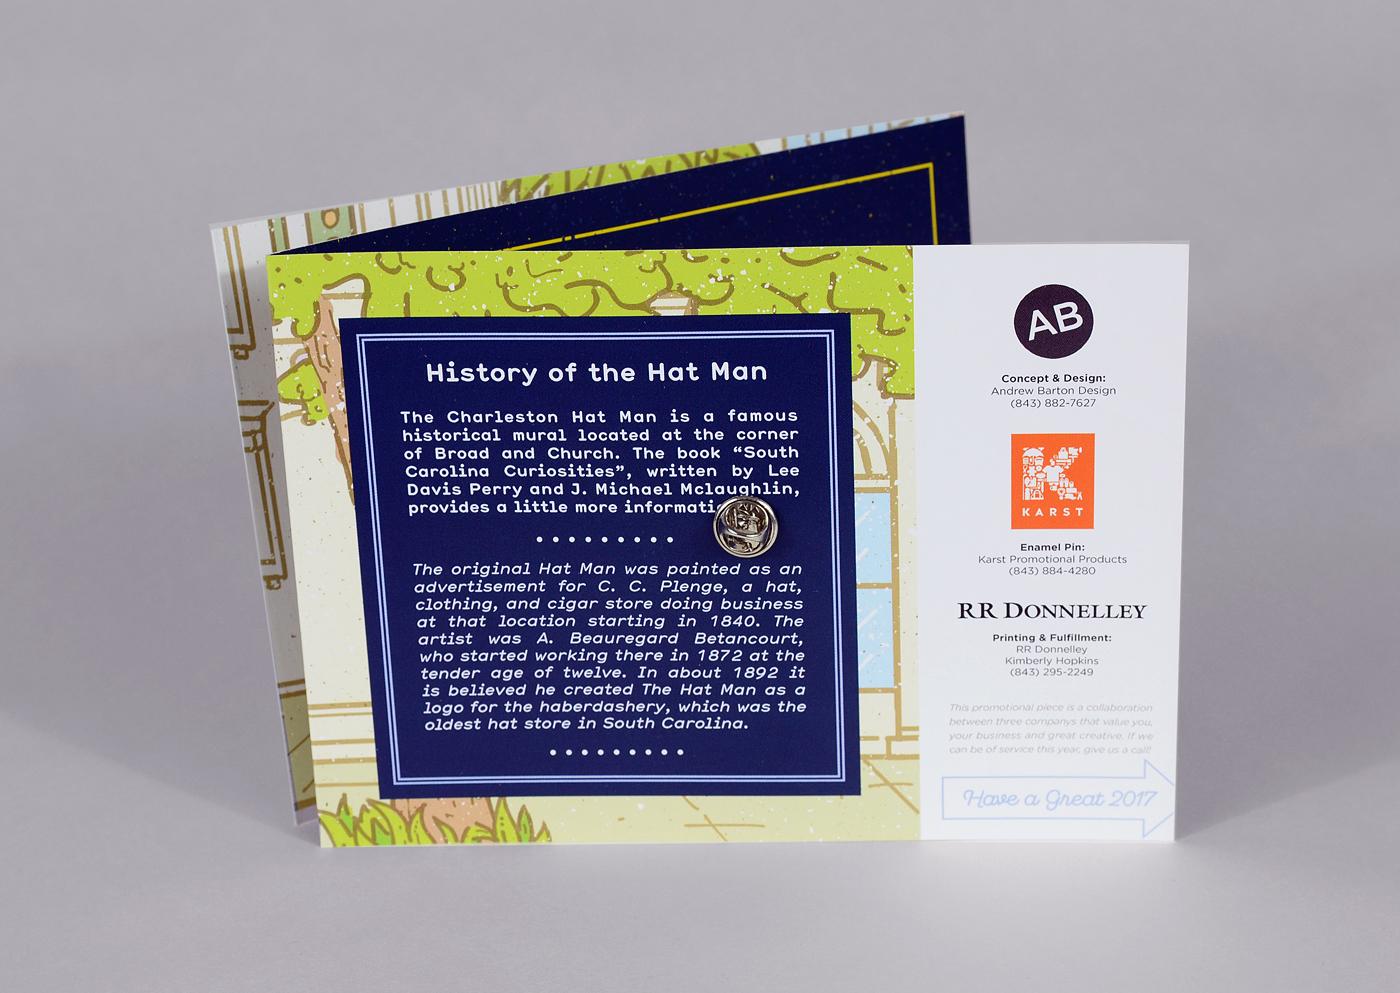 charleston hatman history